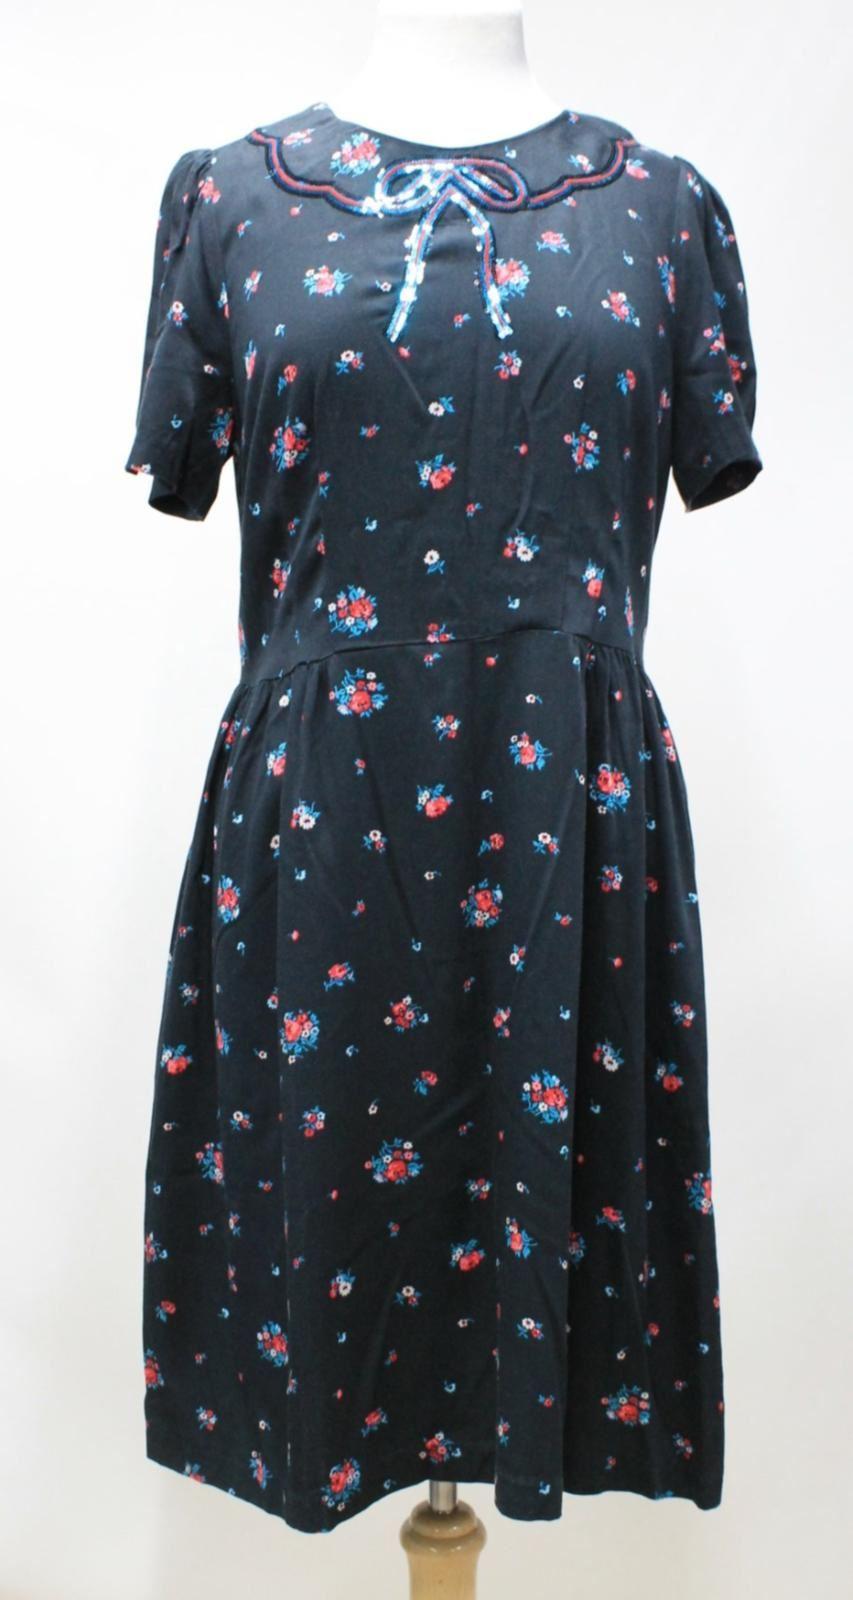 Bnwt scuro Print paillettes Uk14 Cath Shift dettaglio Kidston grigio Dress Rose Ladies Op4rORq